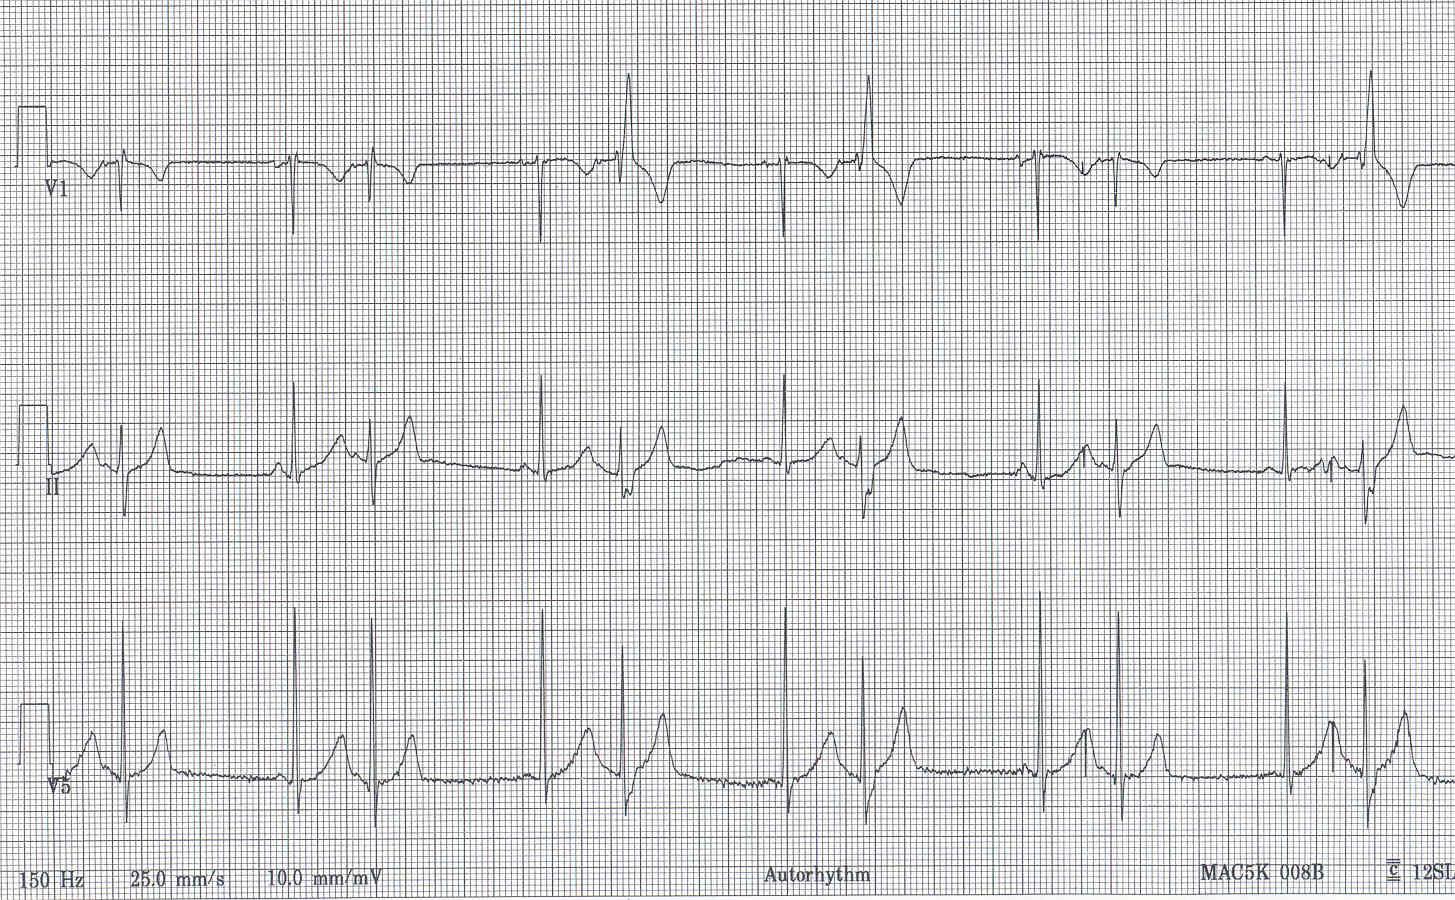 Pedi Cardiology Interpret This Ekg